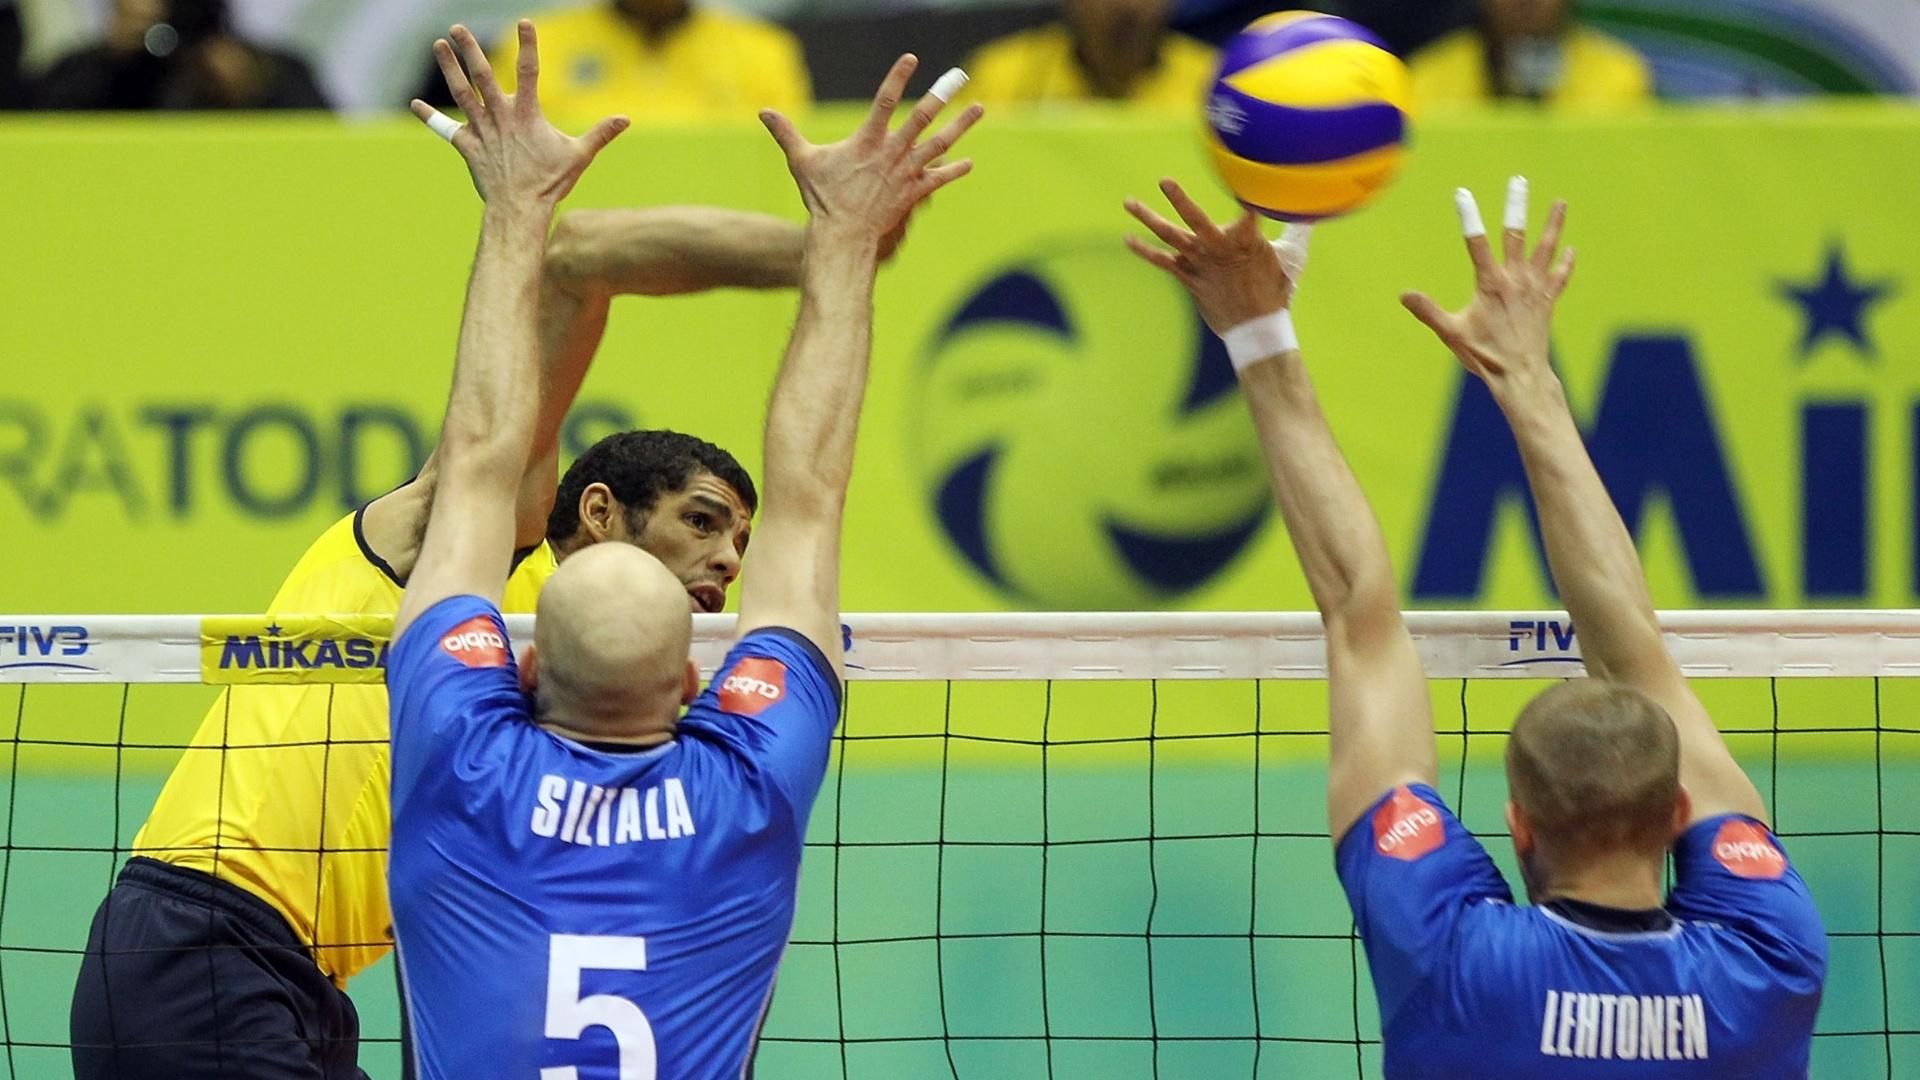 Wallace tenta superar o bloqueio finlandês na partida do Brasil contra a Finlândia válida pela Liga Mundial